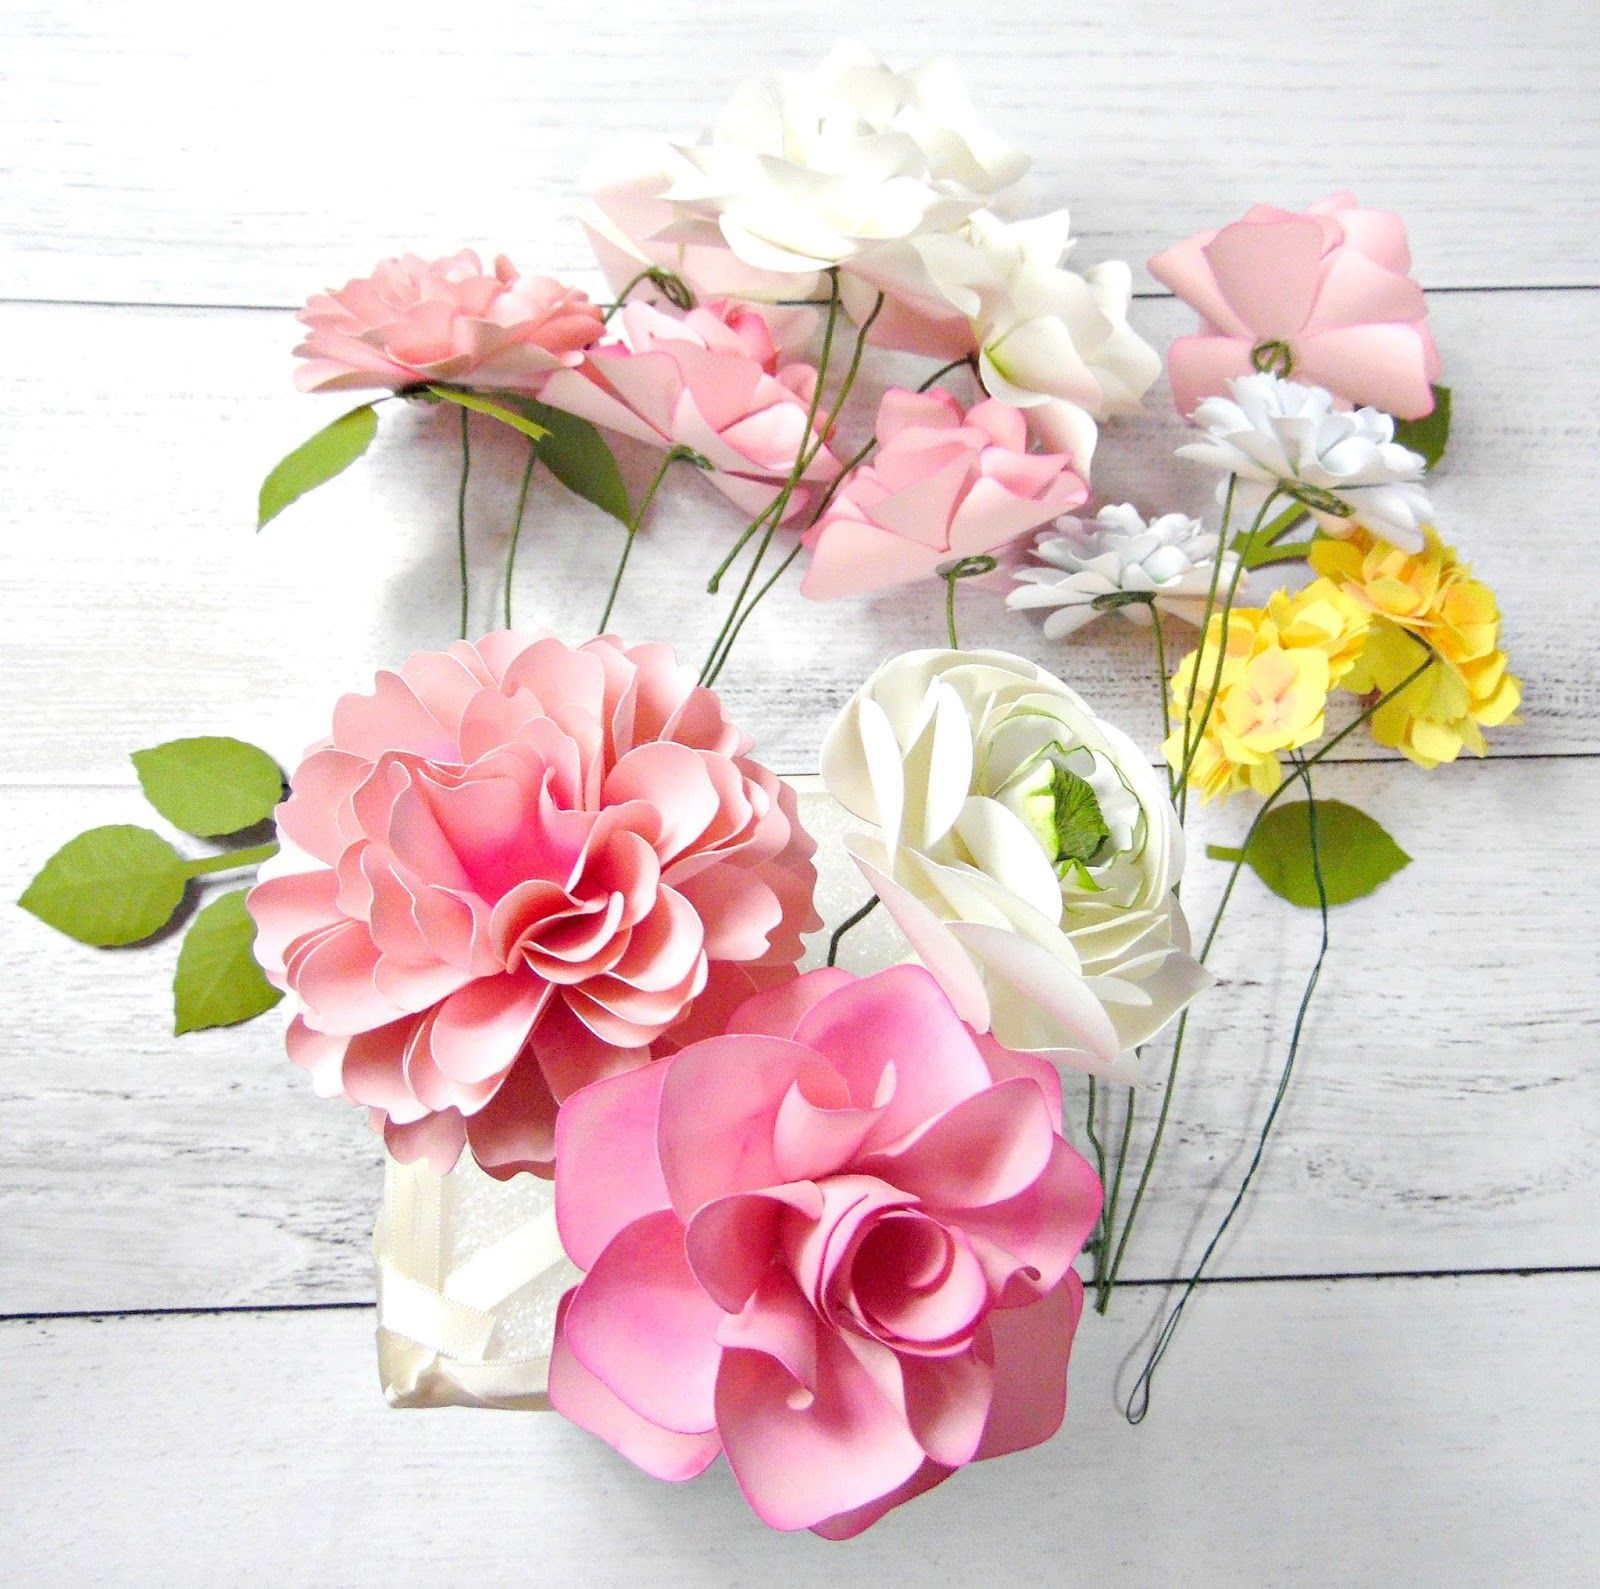 Diy Paper Flower Arrangement Budget Wedding Ideas If Your A Bride